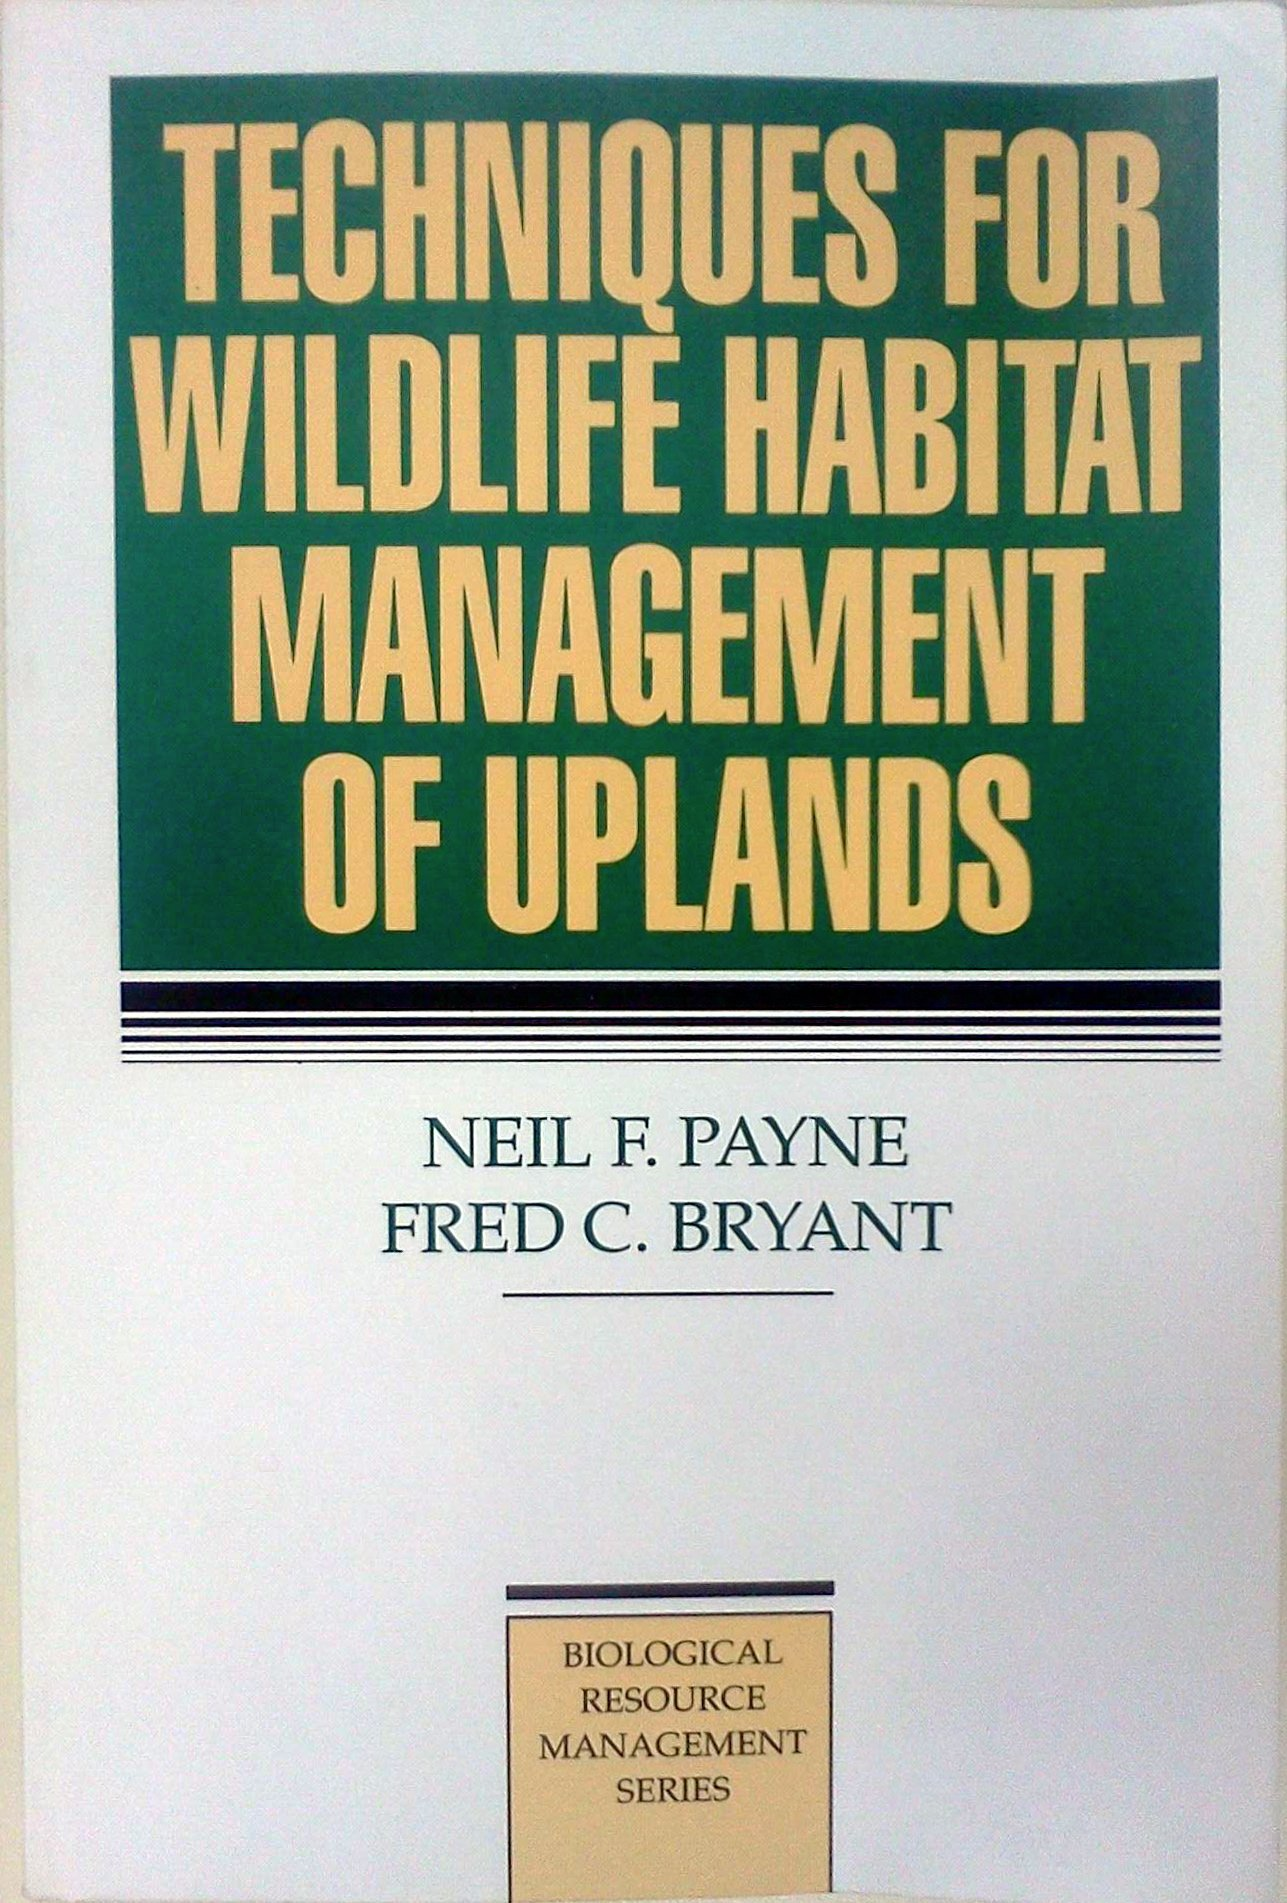 Techniques for Wildlife Habitat Management of Uplands (Biological Resource Management)